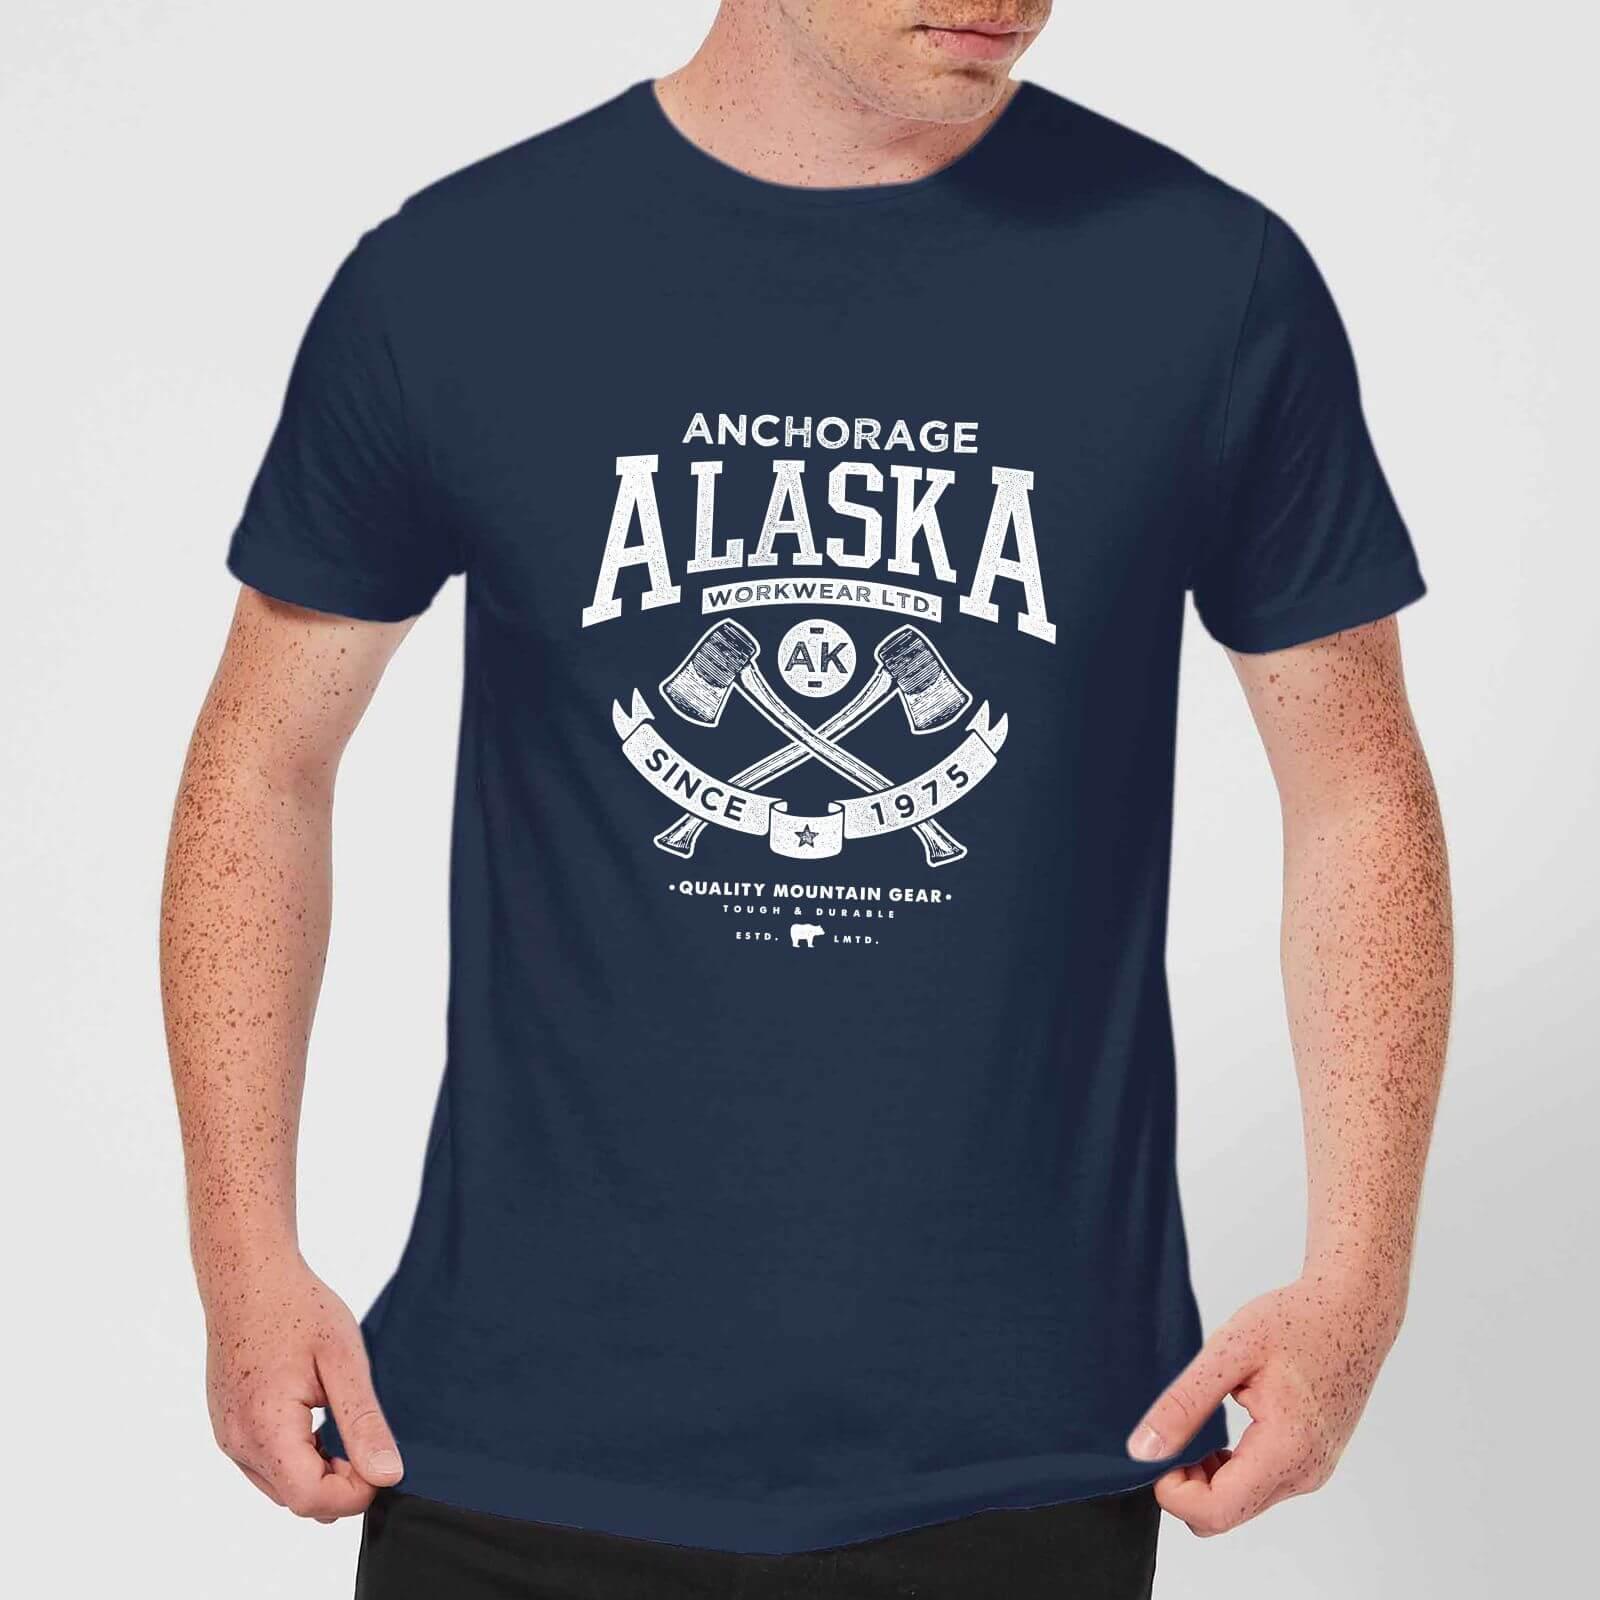 Alaska Men's T-Shirt - Navy - S - Marineblau